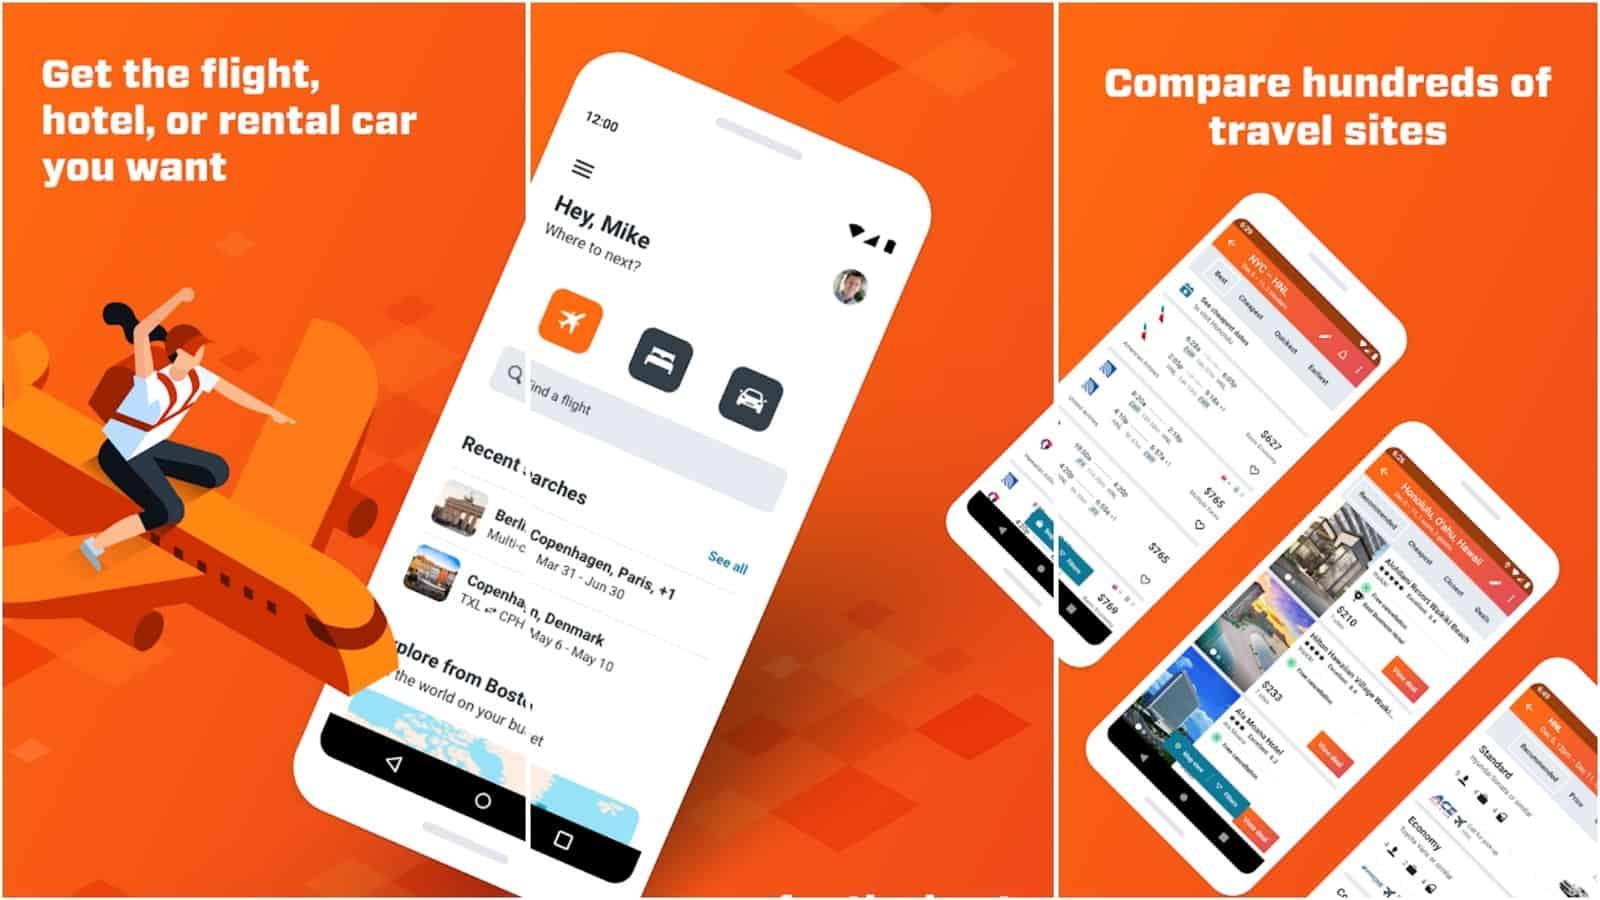 KAYAK app grid image